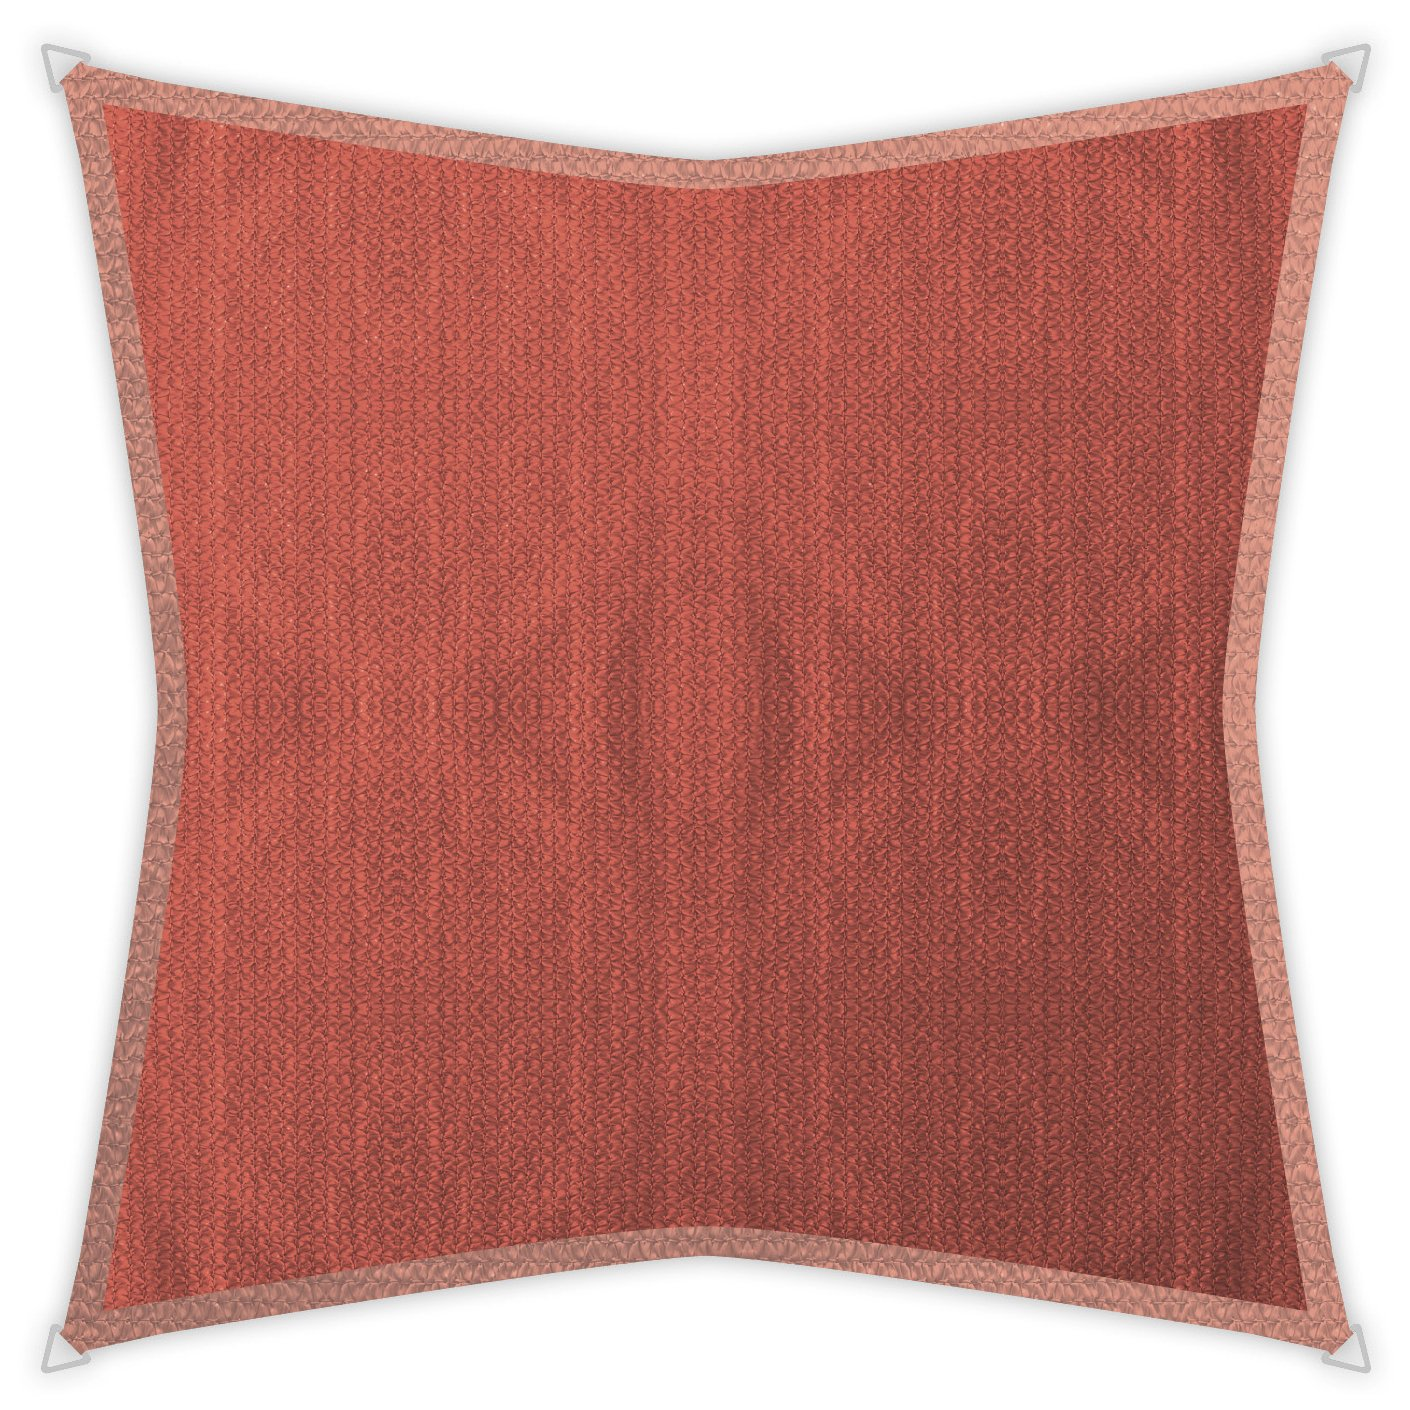 Windhager 10974 Tenda da Sole, 5 Metri Quadrati, Terrac